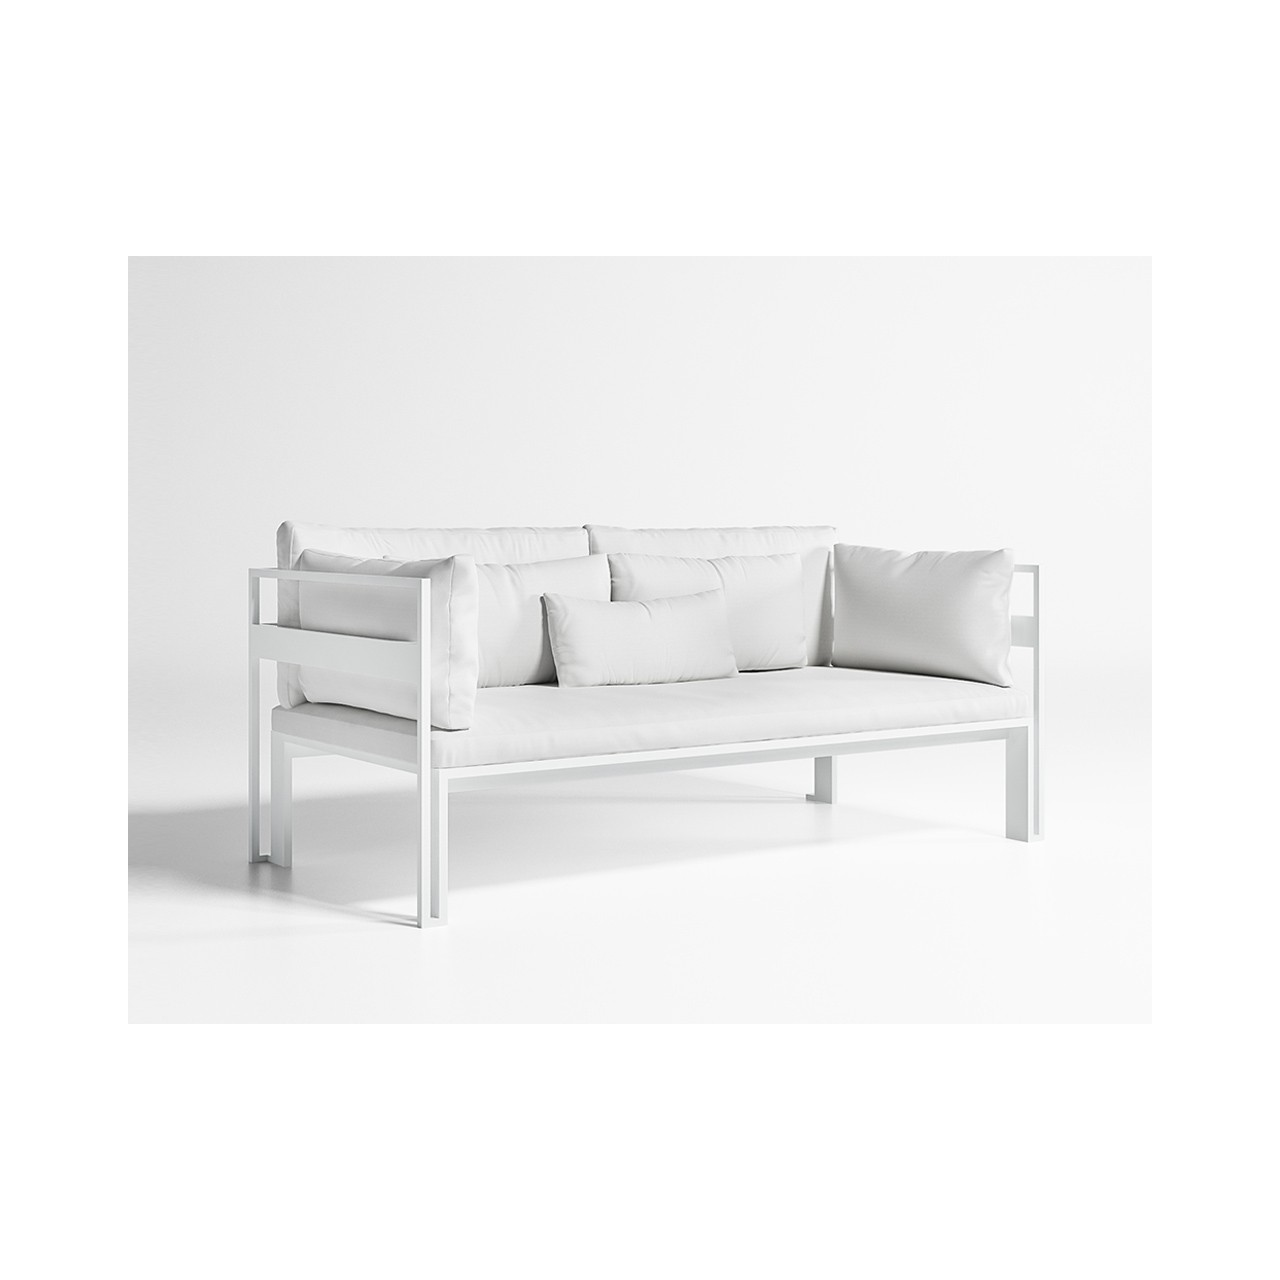 Jian - Sofa Protective Cover